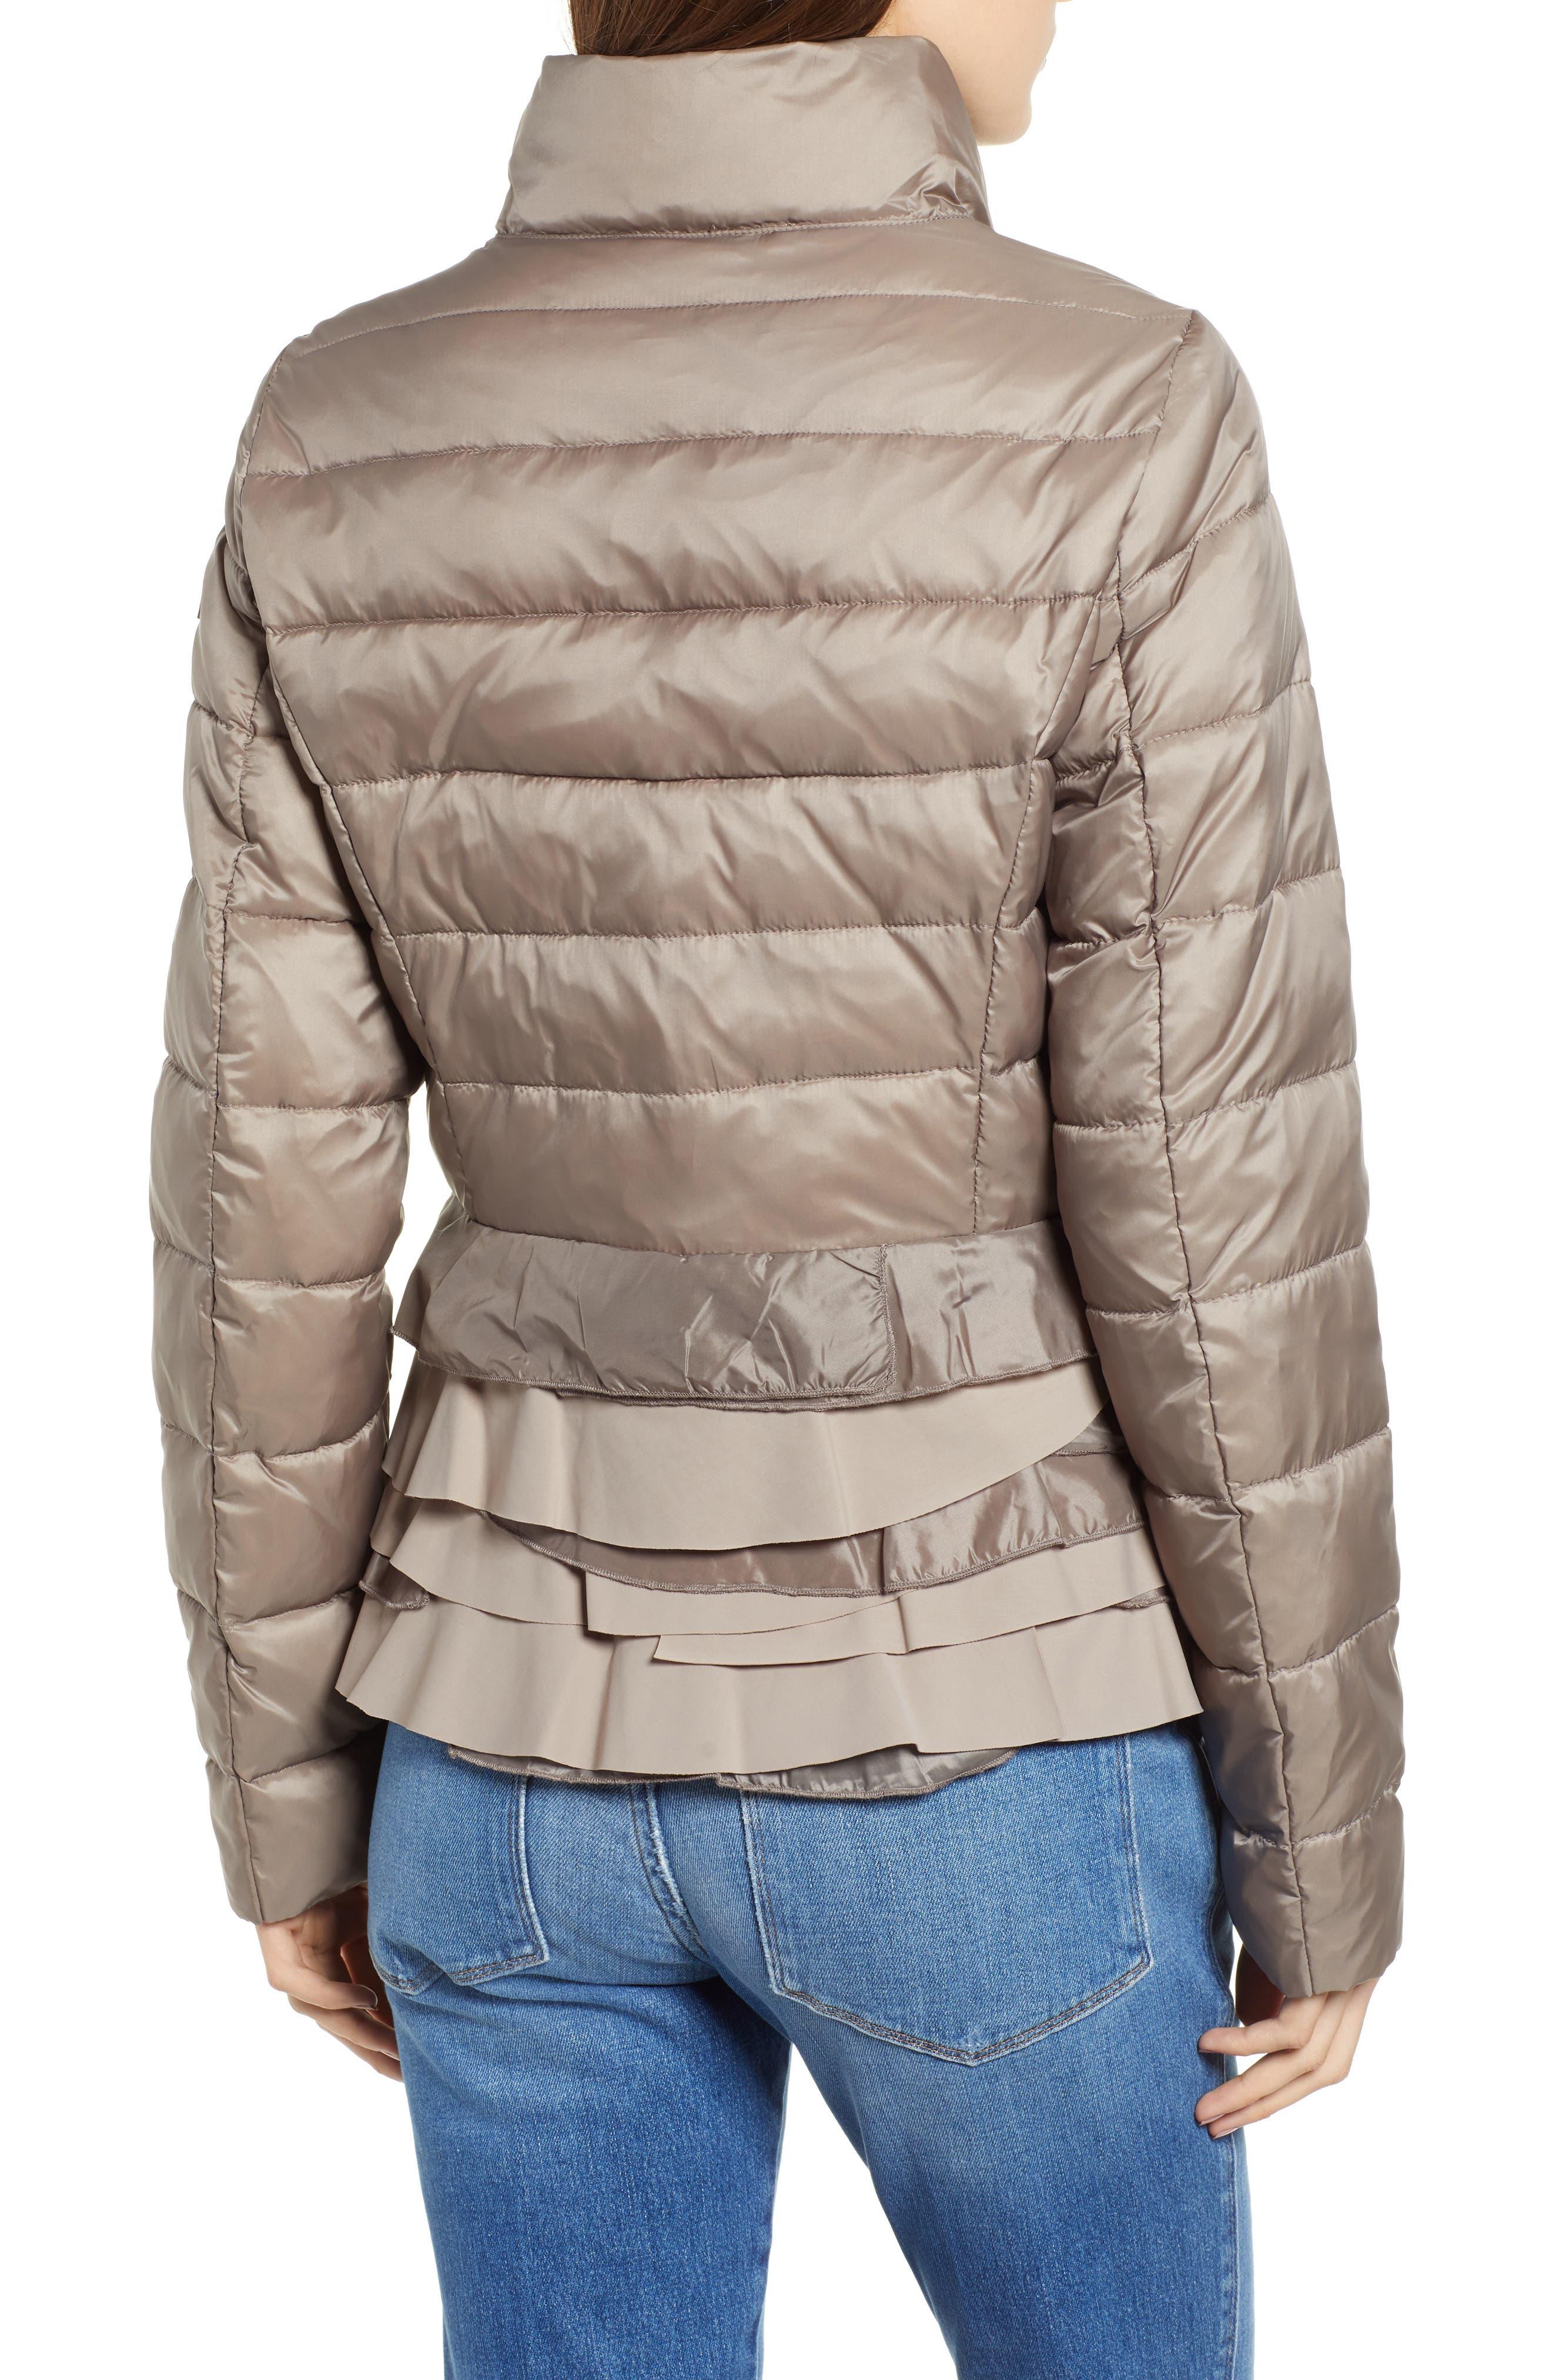 Zoey Ruffle Hem Puffer Jacket,                             Alternate thumbnail 2, color,                             TRUFFLE